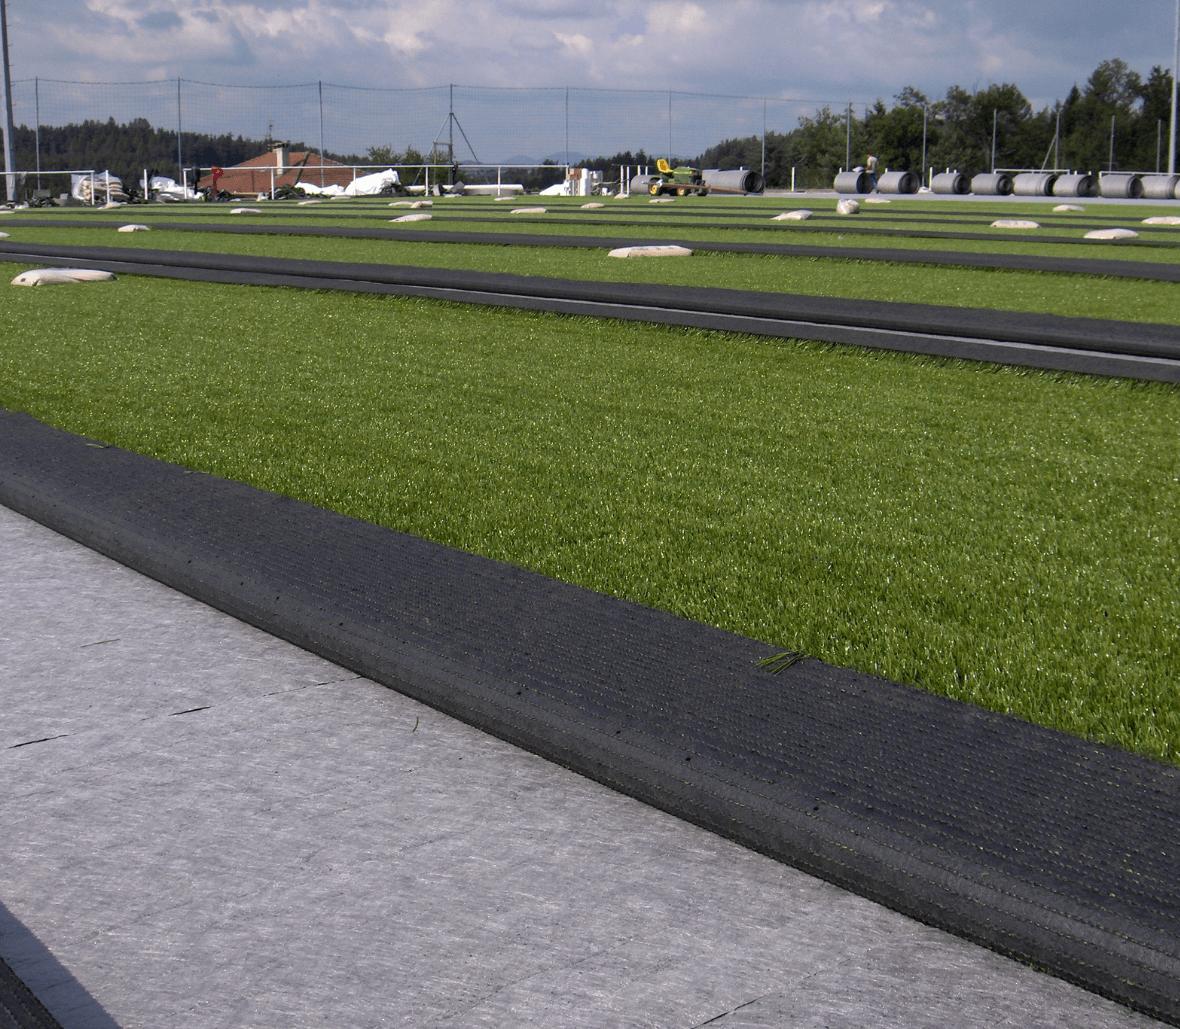 EnkaFlex_shockpad & drainage system for sportsfields_copyrights Low & Bonar_Enka Solutions (4)